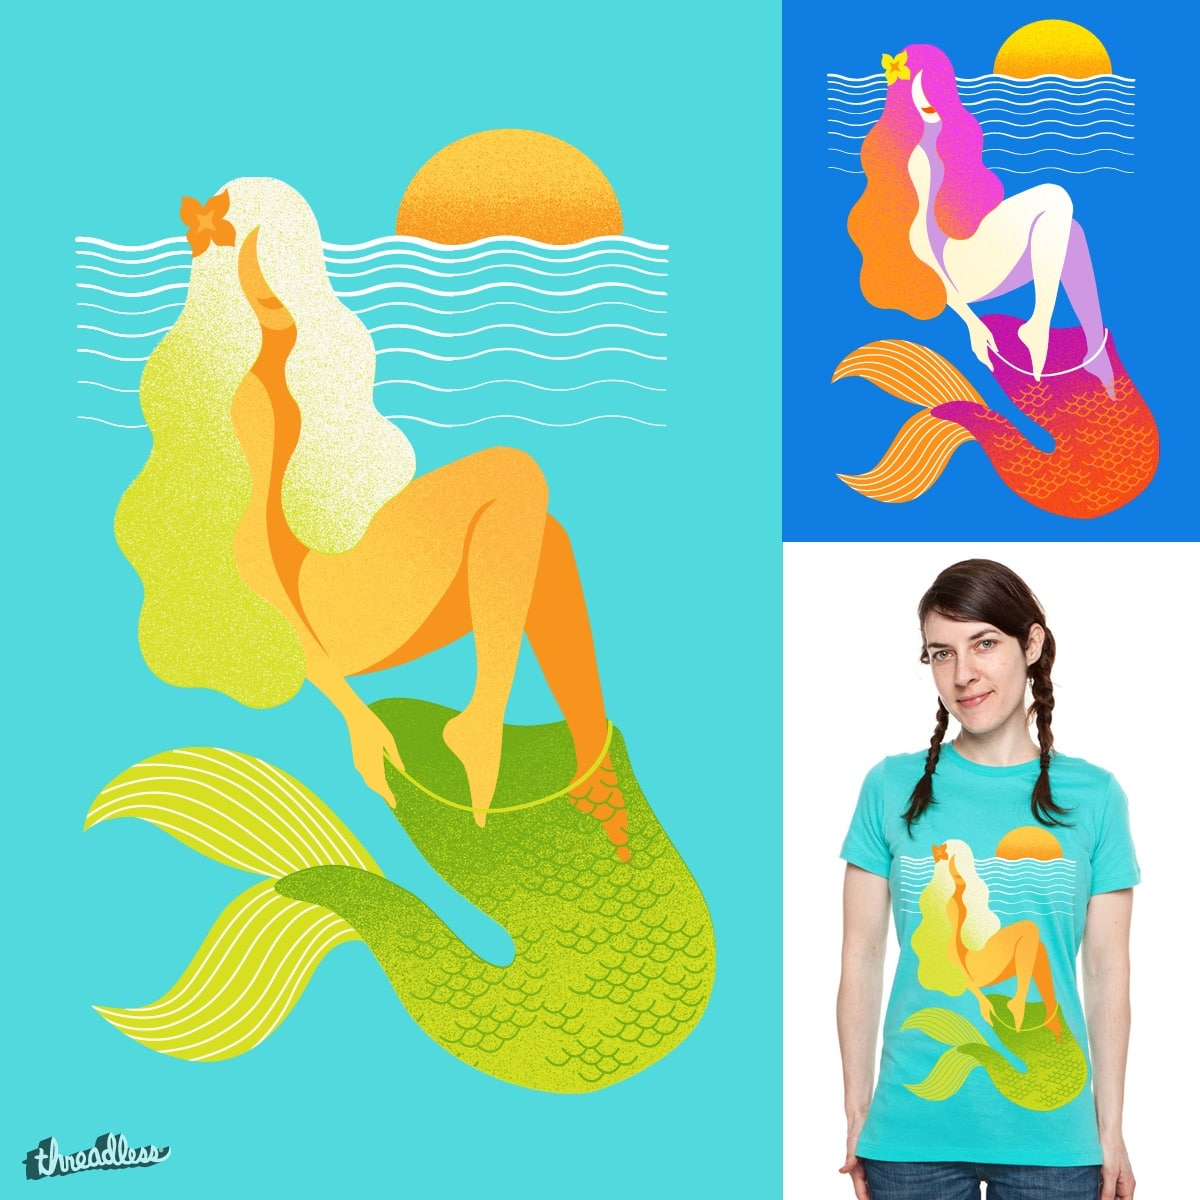 Sea leggings by steamedbun on Threadless